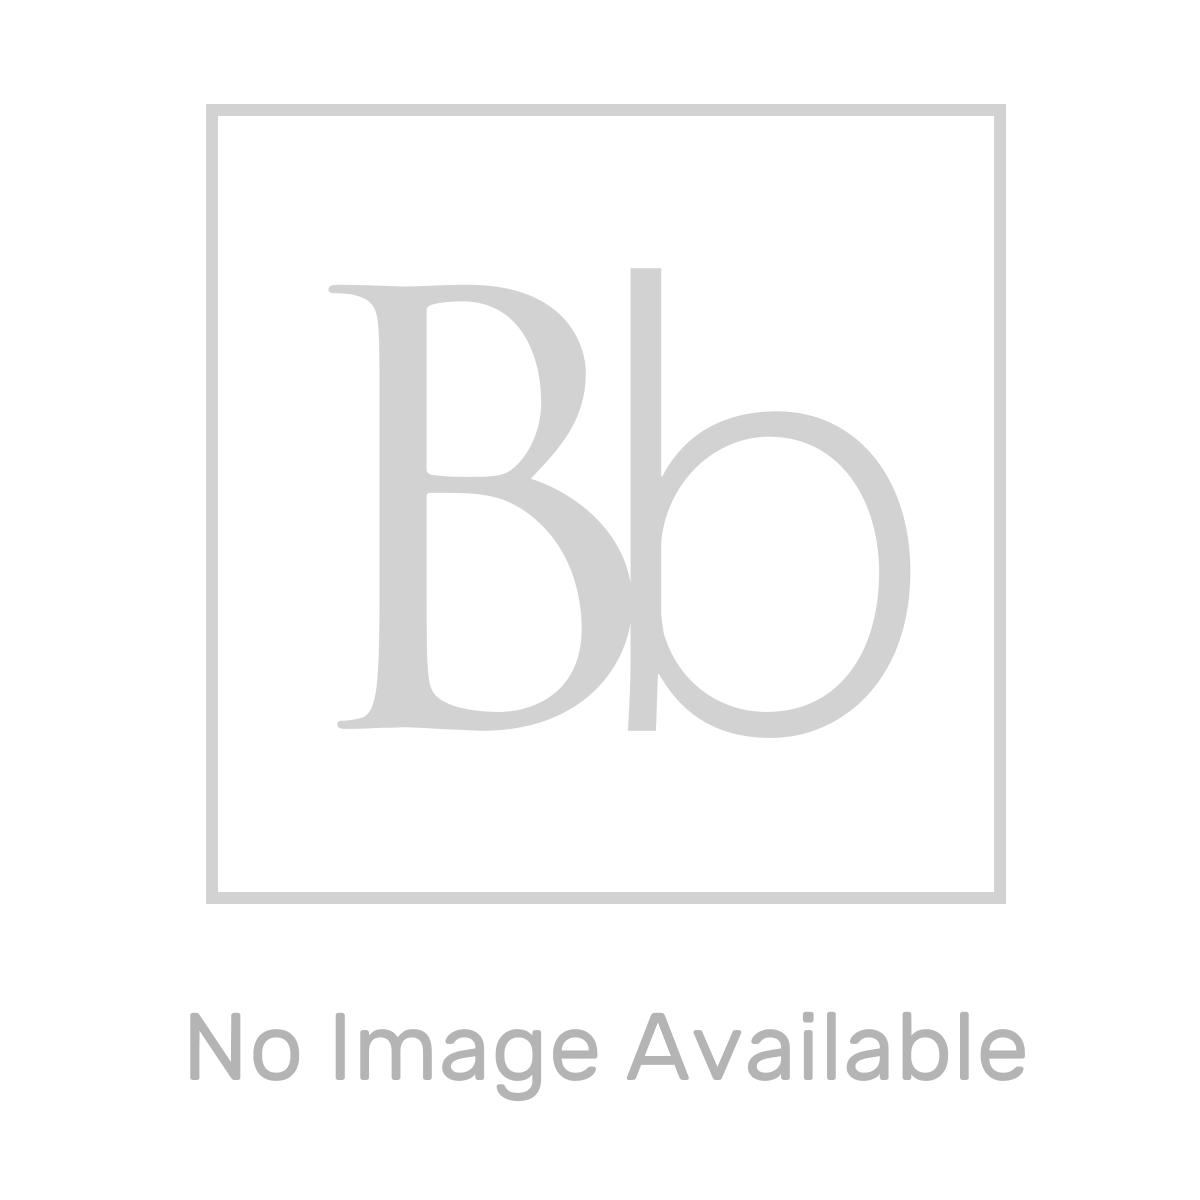 RAK Maremma Sand Matt Tile 600 x 600mm Lifestyle